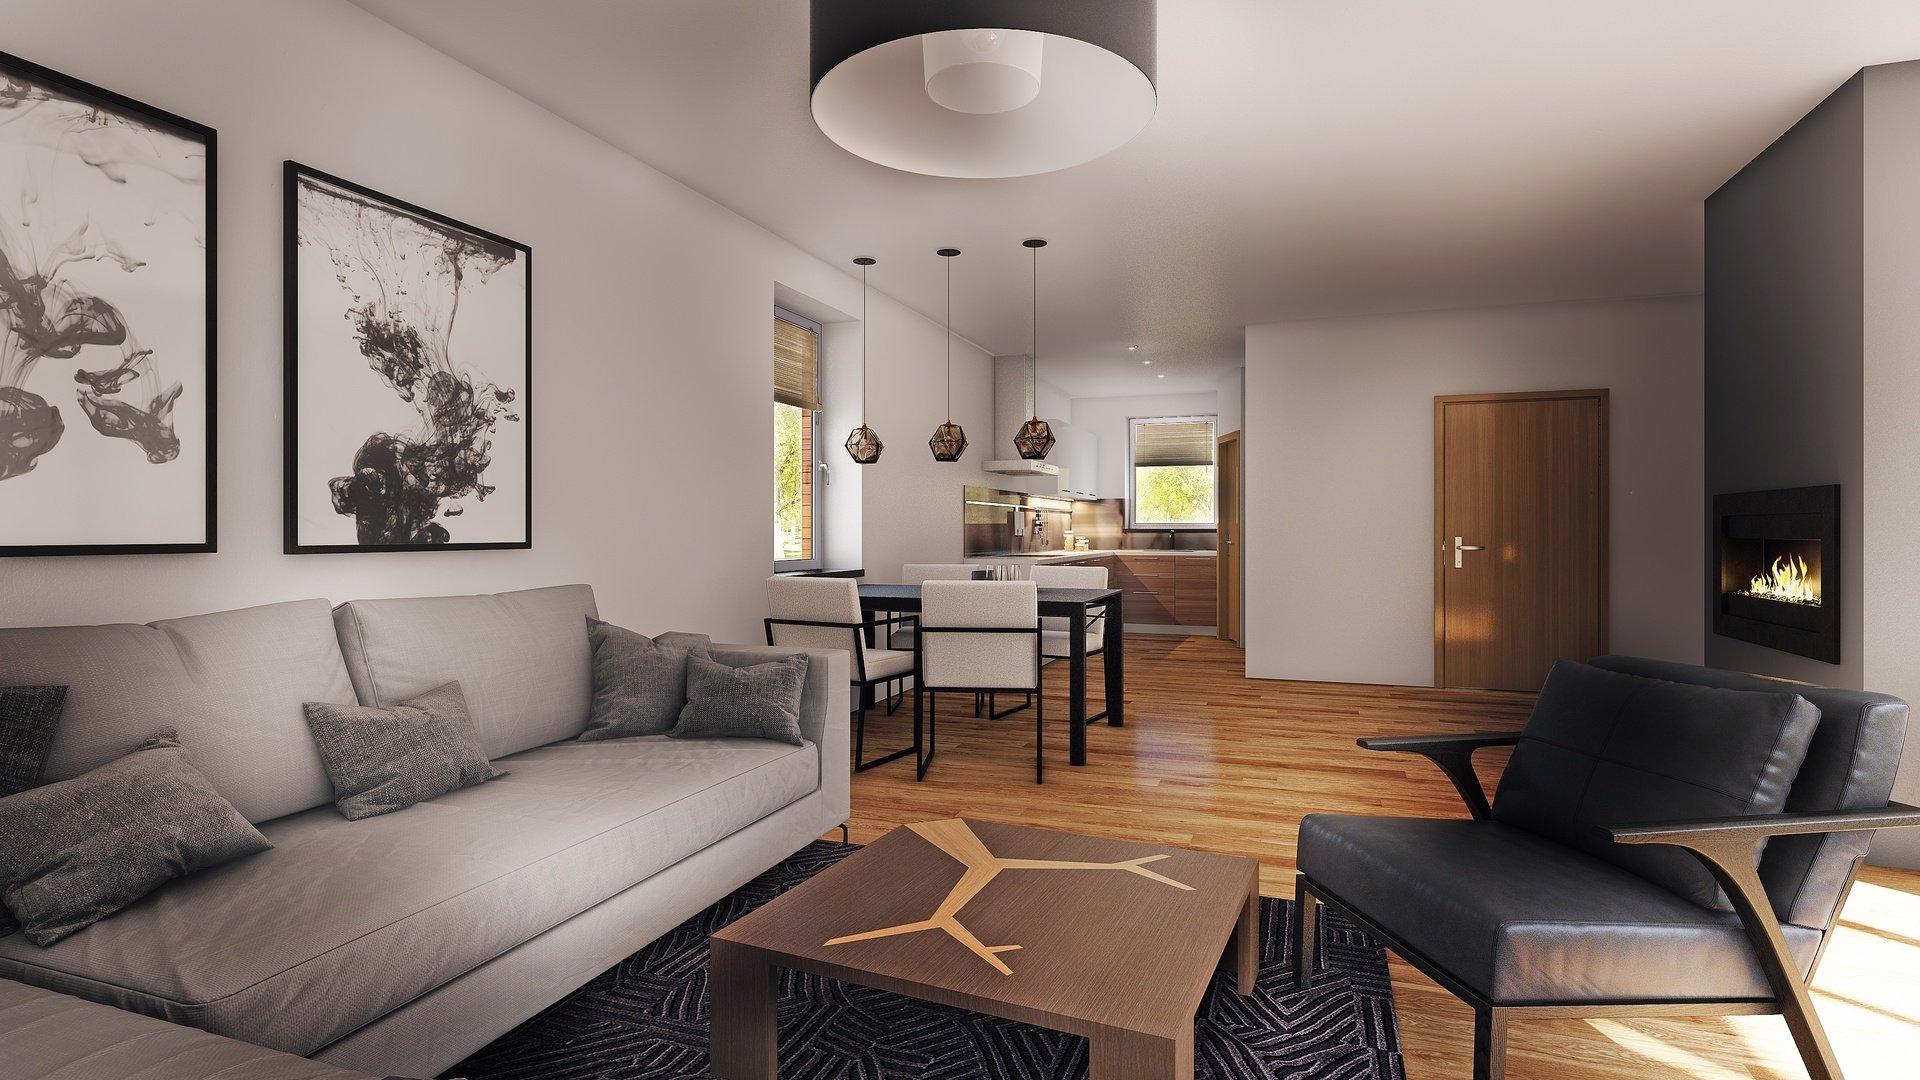 prodej-rodinne-domy-919-m2-osice-okr-hradec-kralove-rd01-int-cam02-v02-1-7e8609